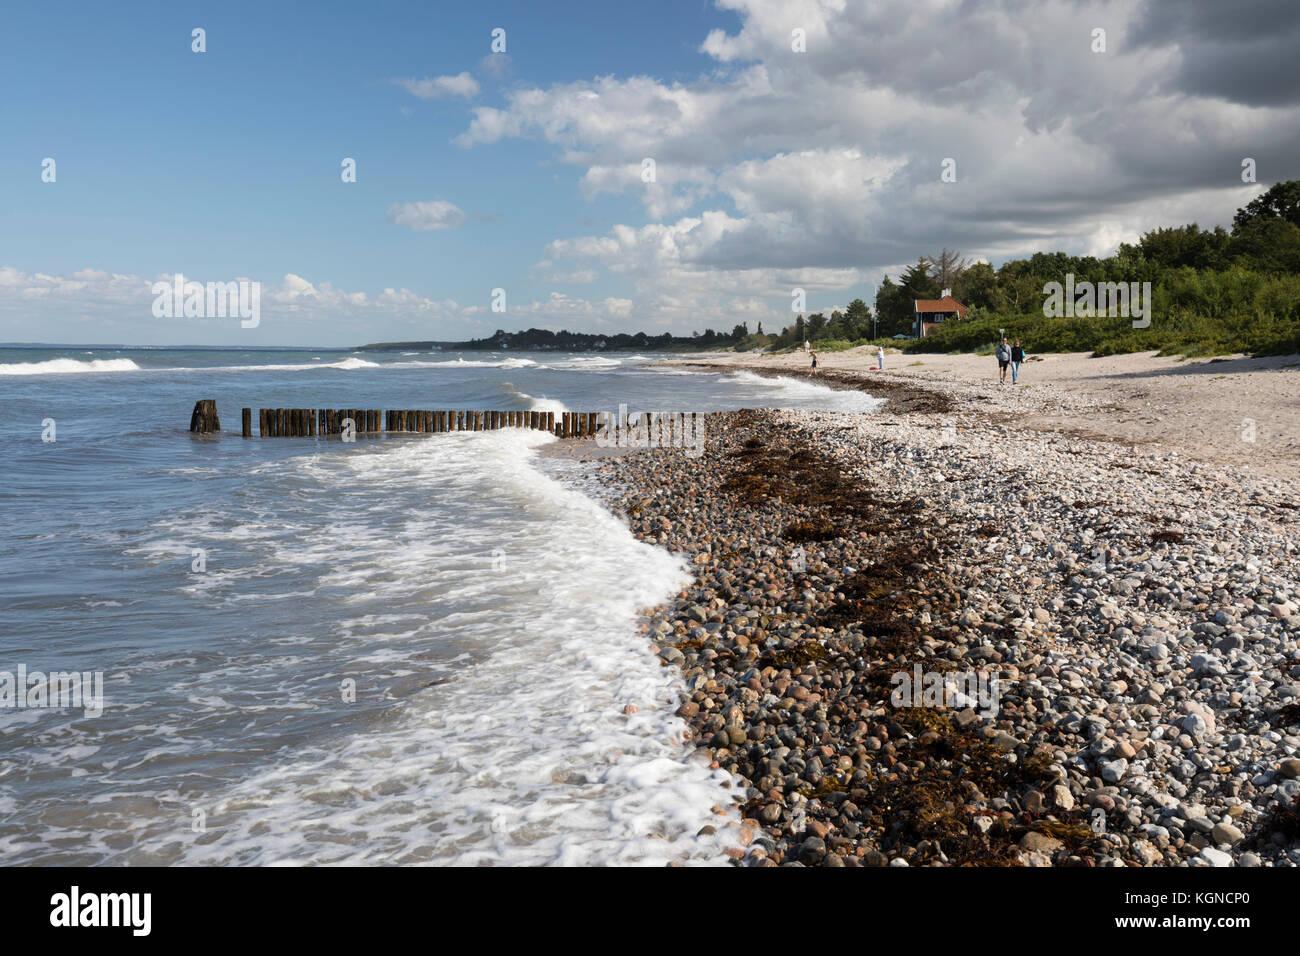 View over Munkerup beach, Munkerup, Kattegat Coast, Zealand, Denmark, Europe - Stock Image